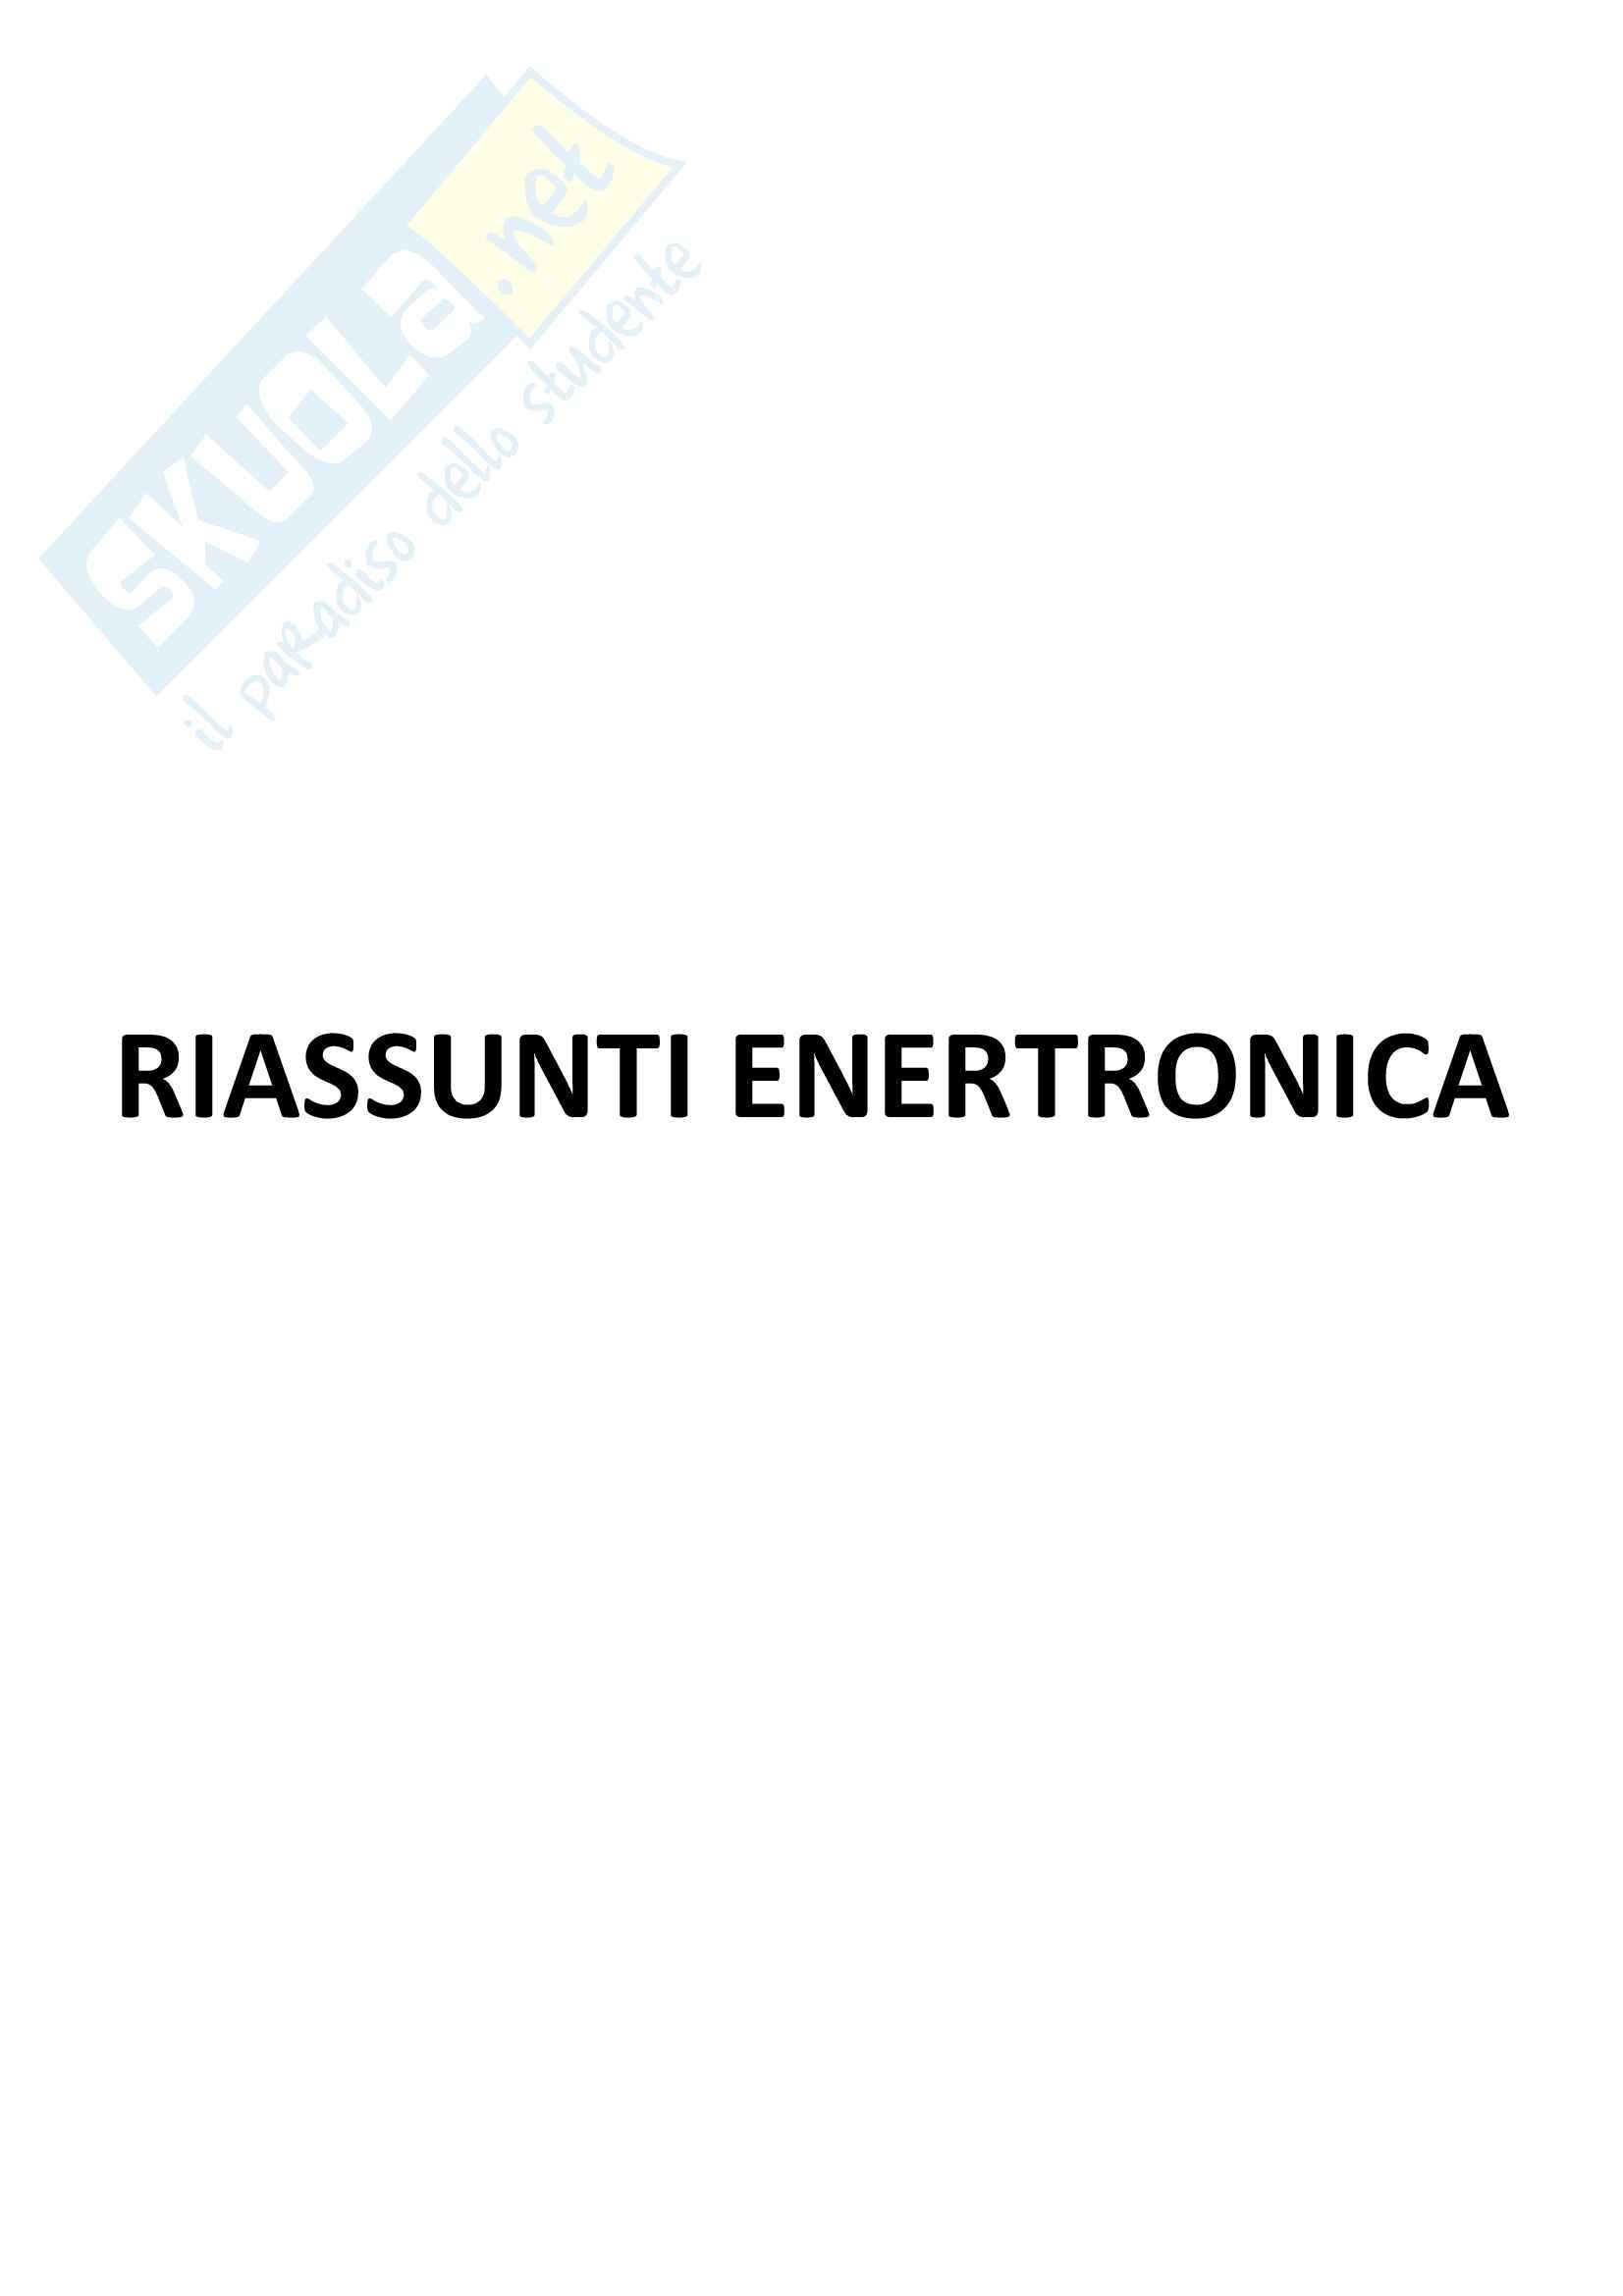 Riassunti teoria enertronica prof Emanuele Bertoluzzo